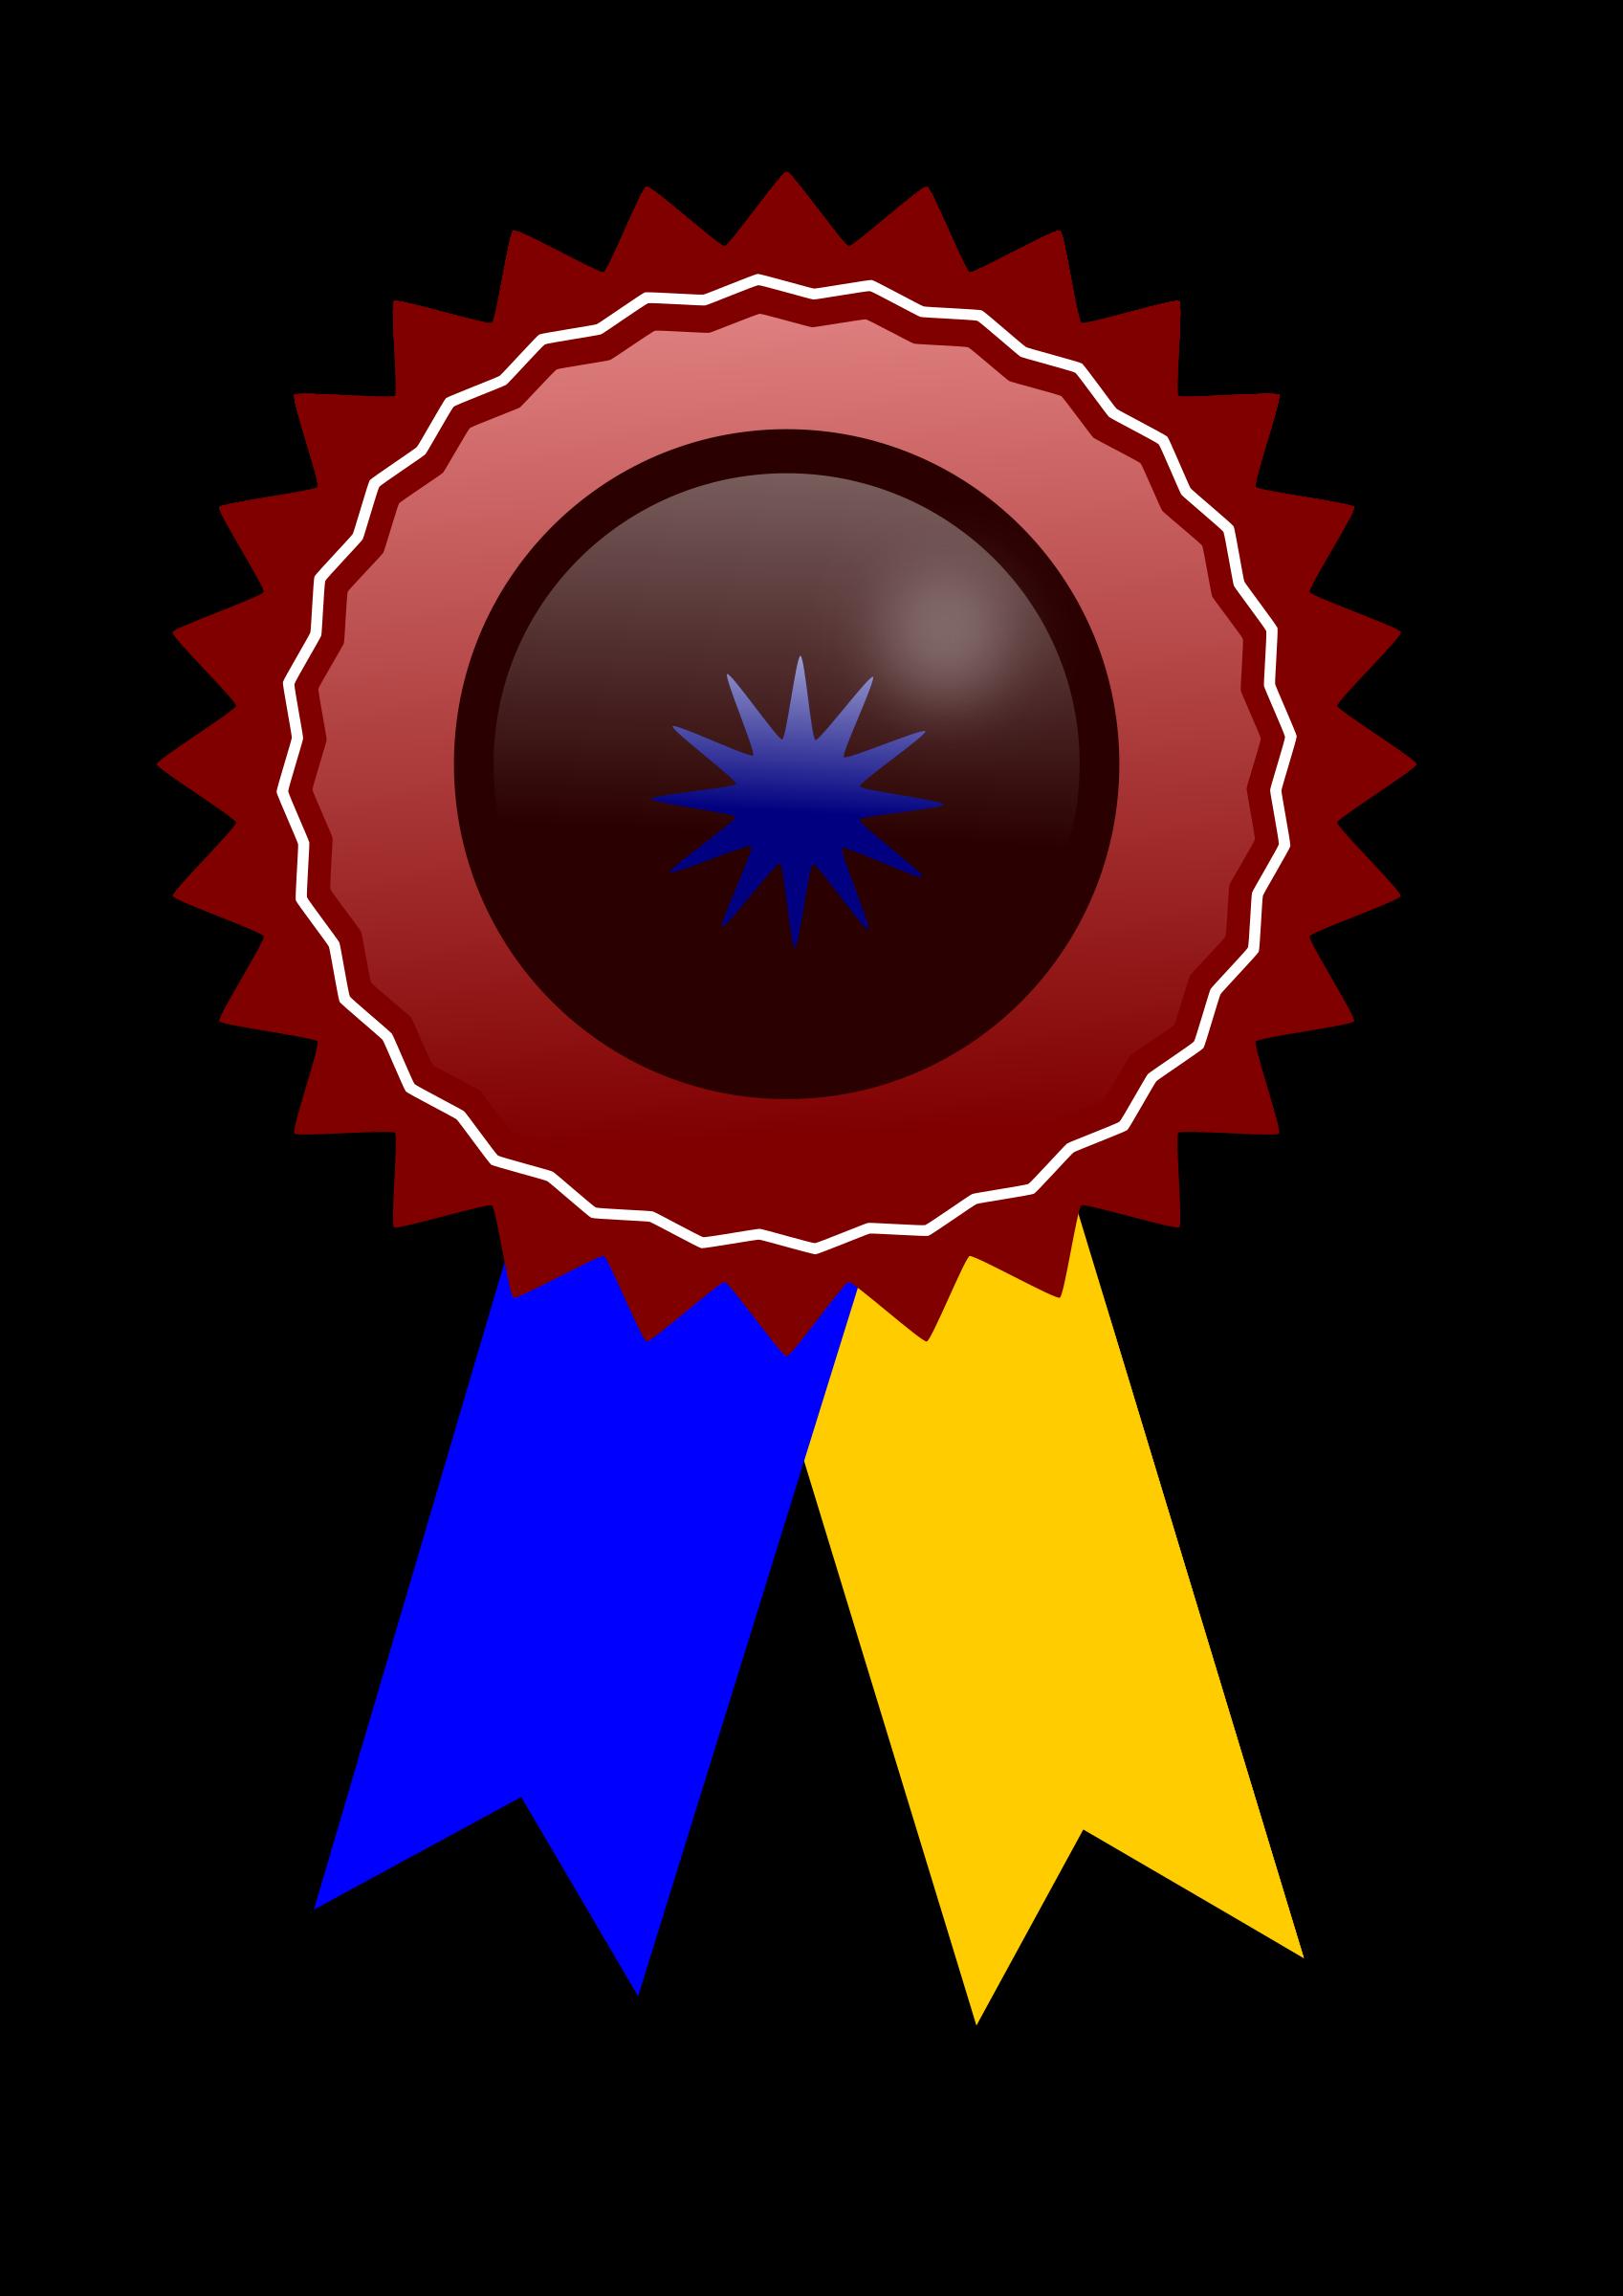 Red ribbon award clipart jpg royalty free stock Ribbon award clipart - ClipartFest jpg royalty free stock